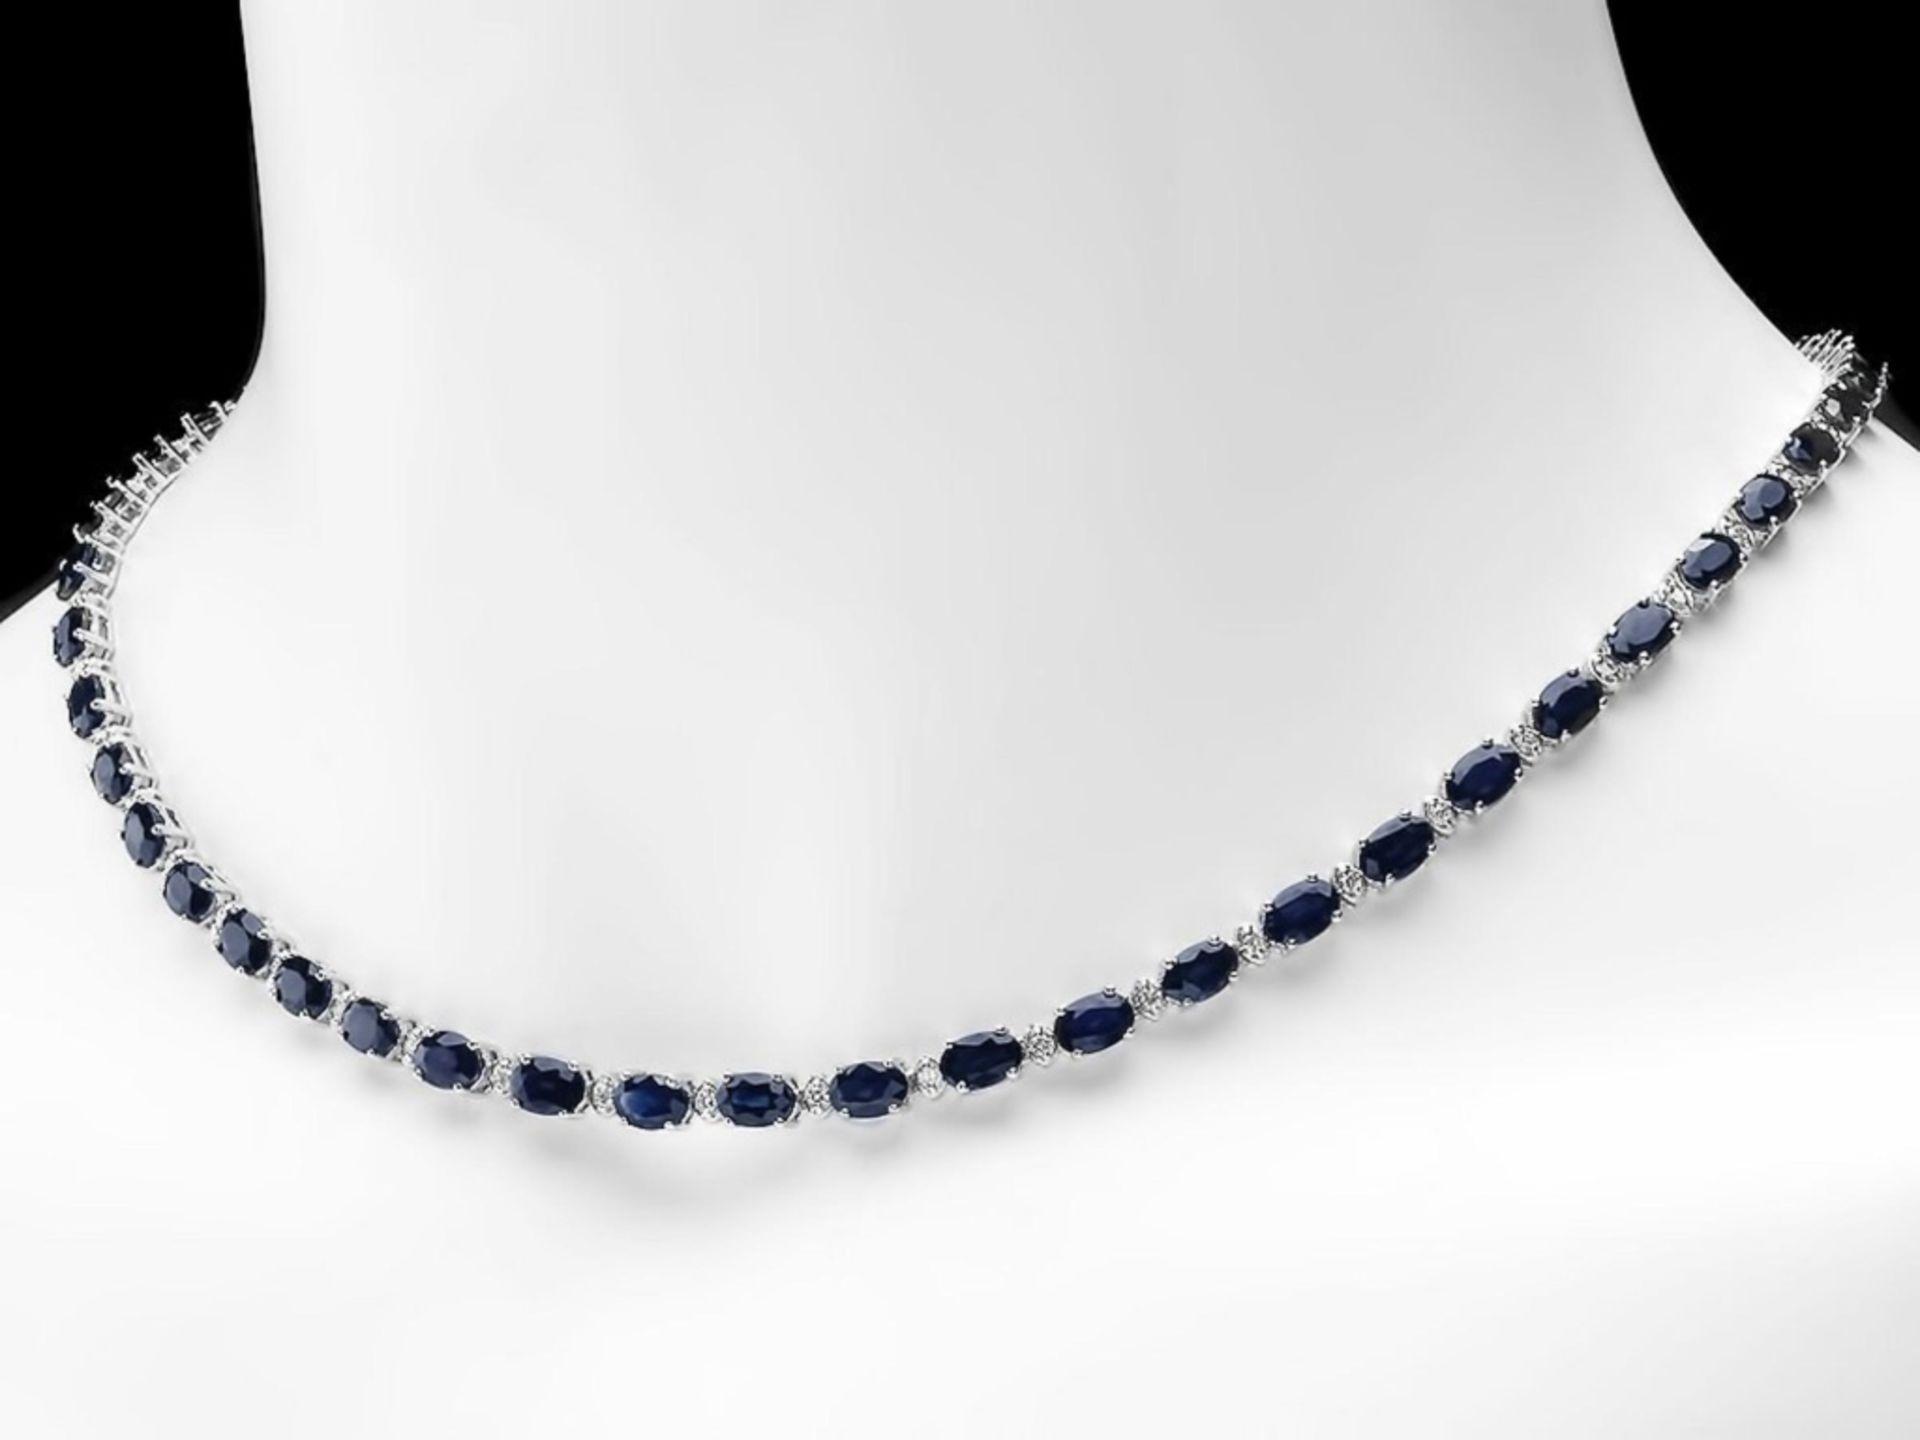 `14k Gold 25.00ct Sapphire & 1.00ct Diamond Neckla - Image 3 of 5